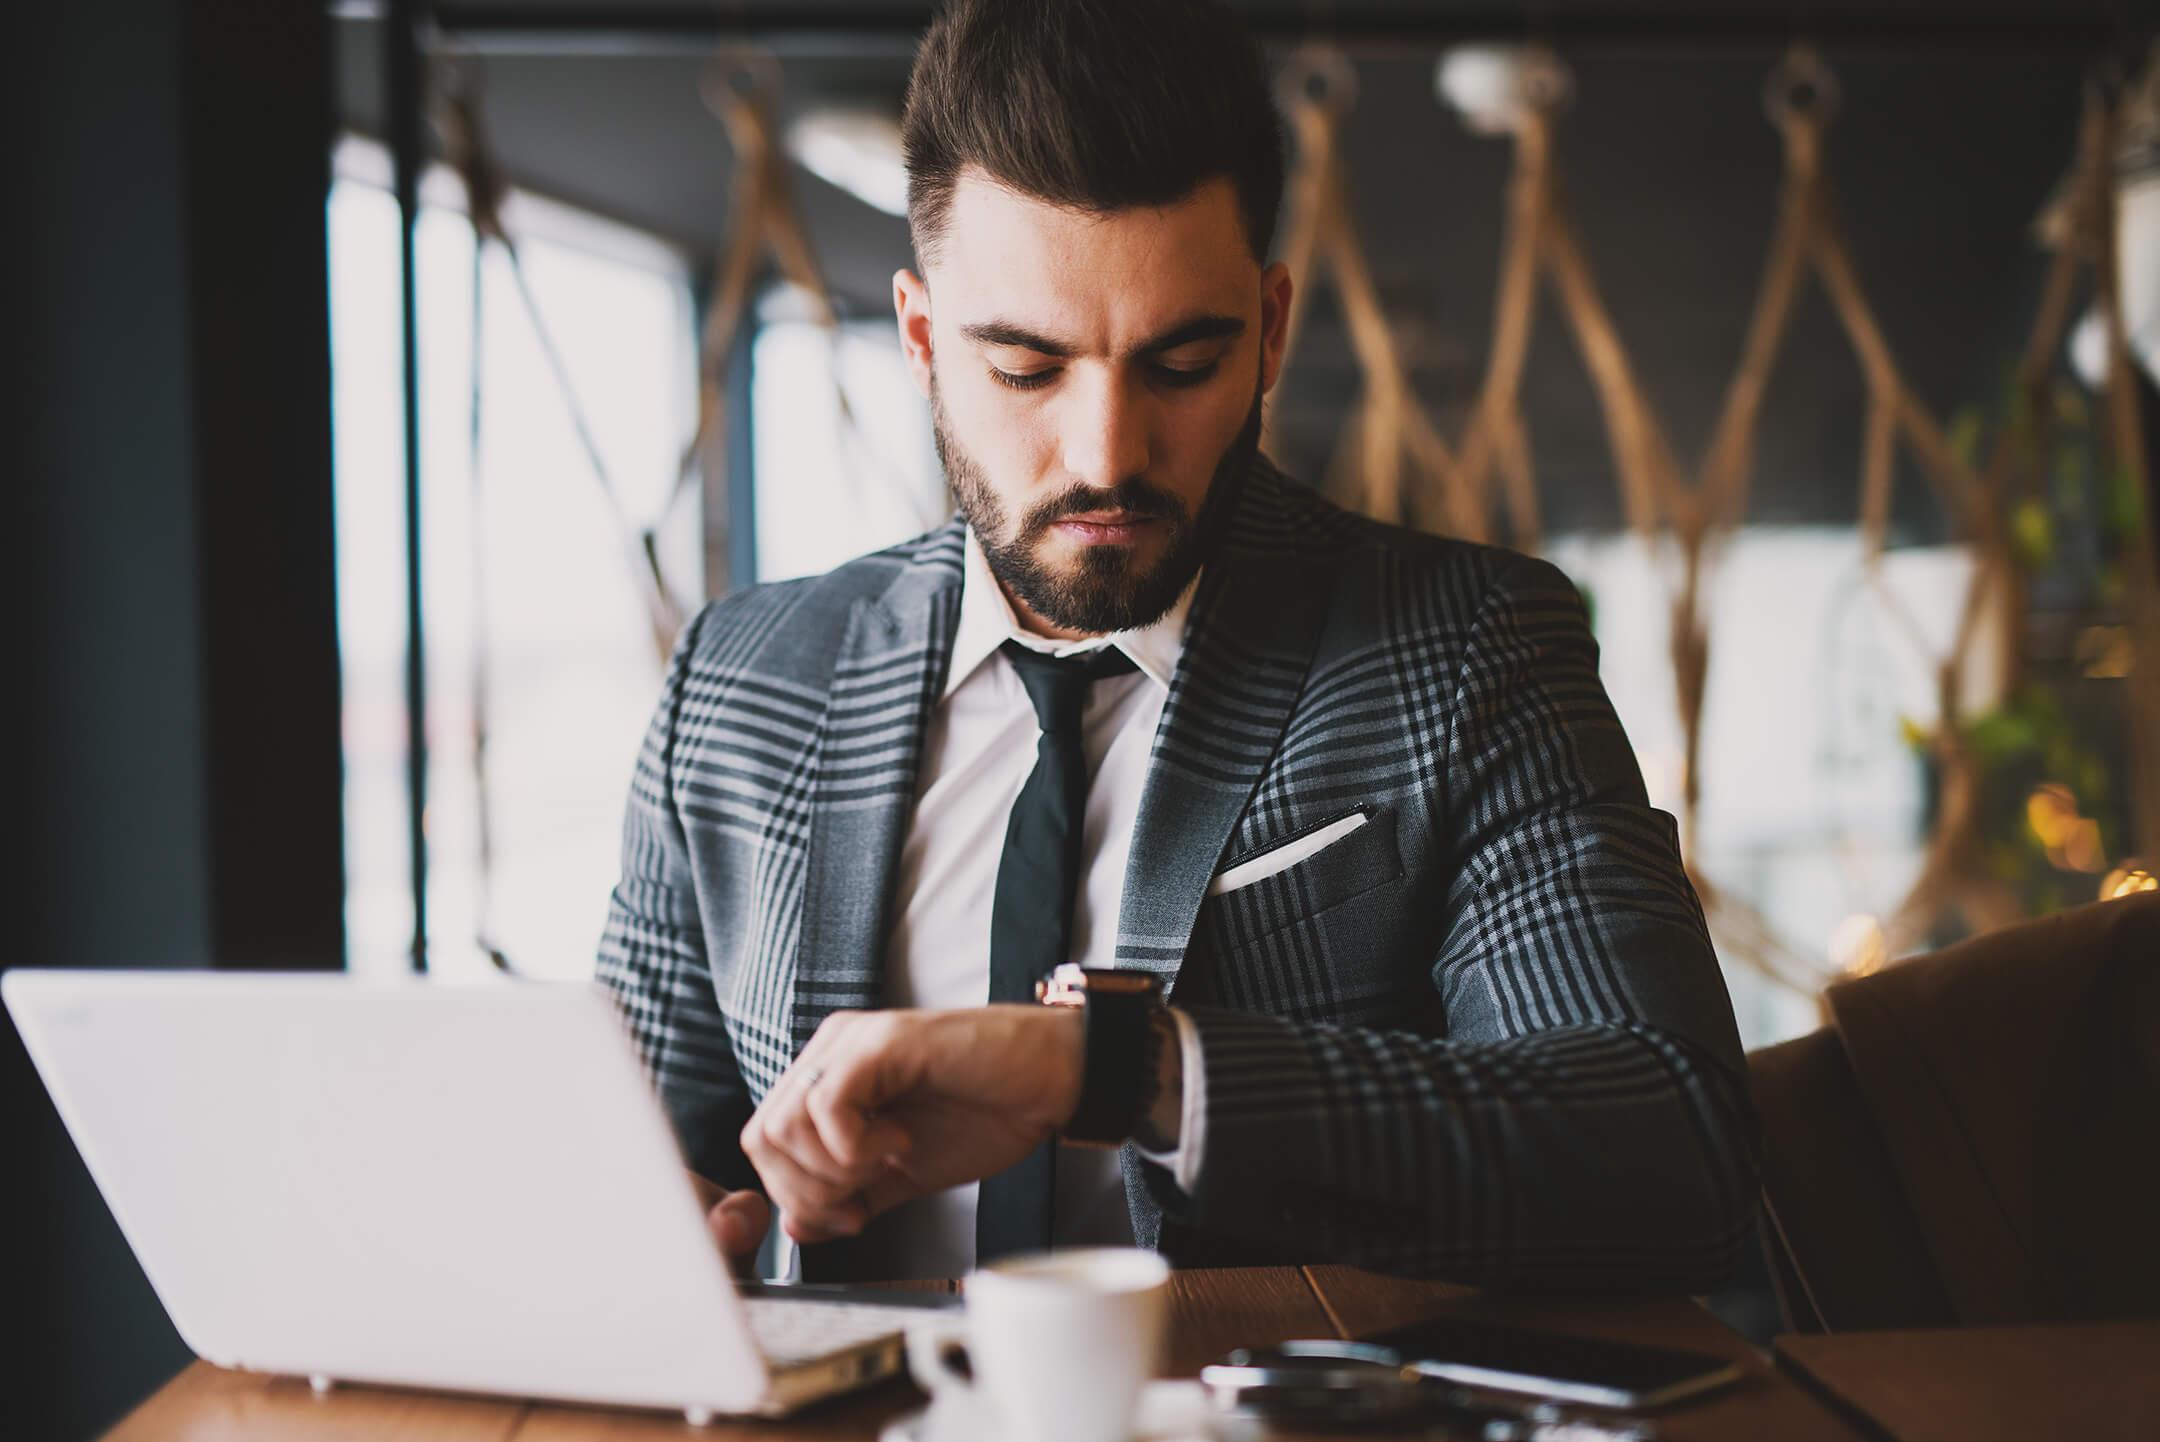 Real Estate Agent Managing a Social Media Account